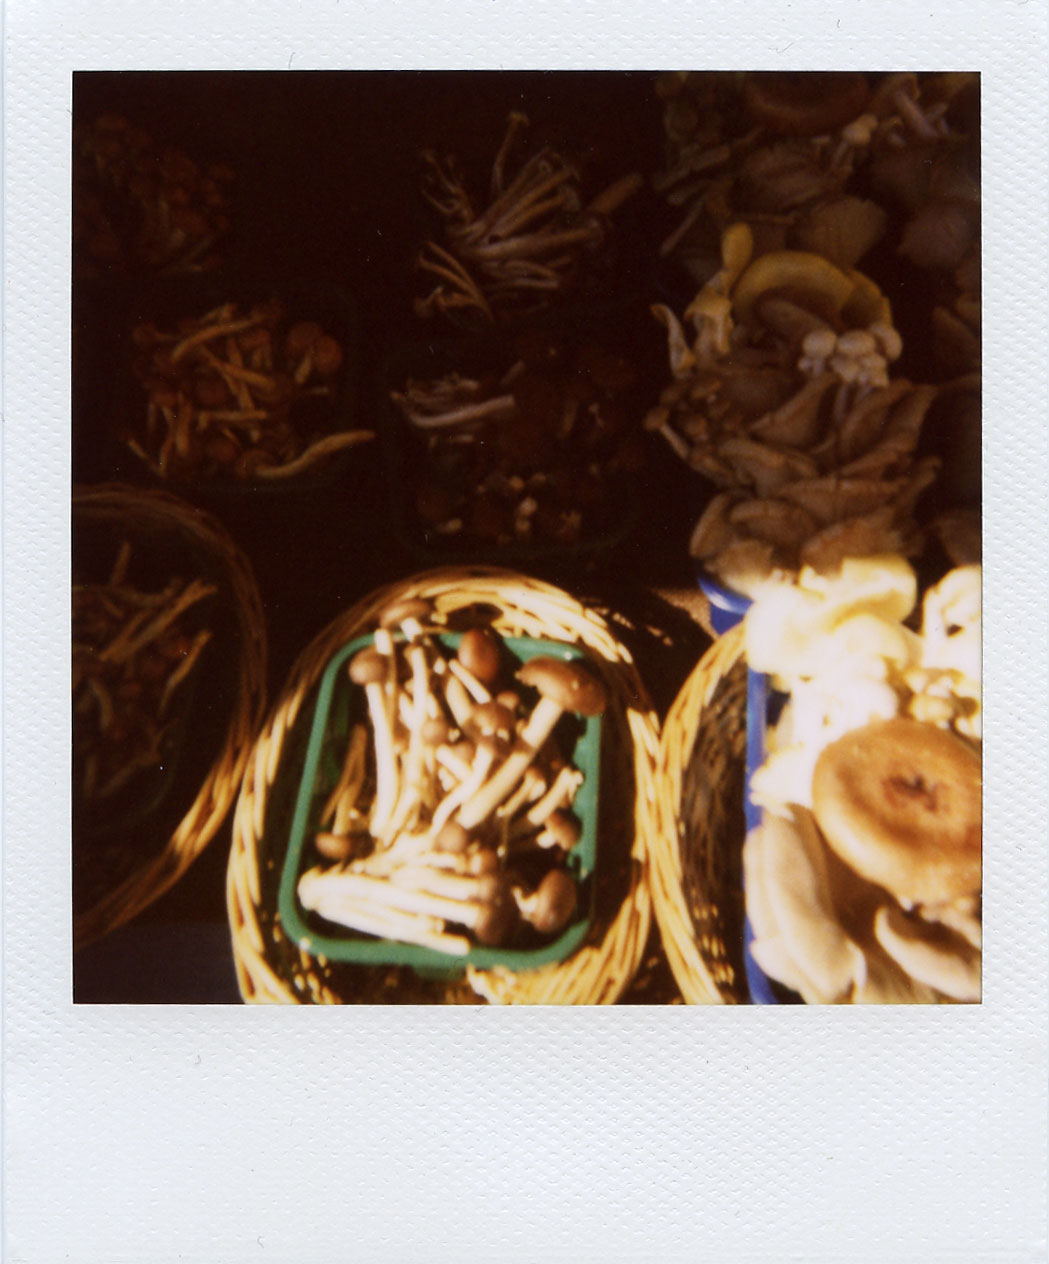 pola: shrooms